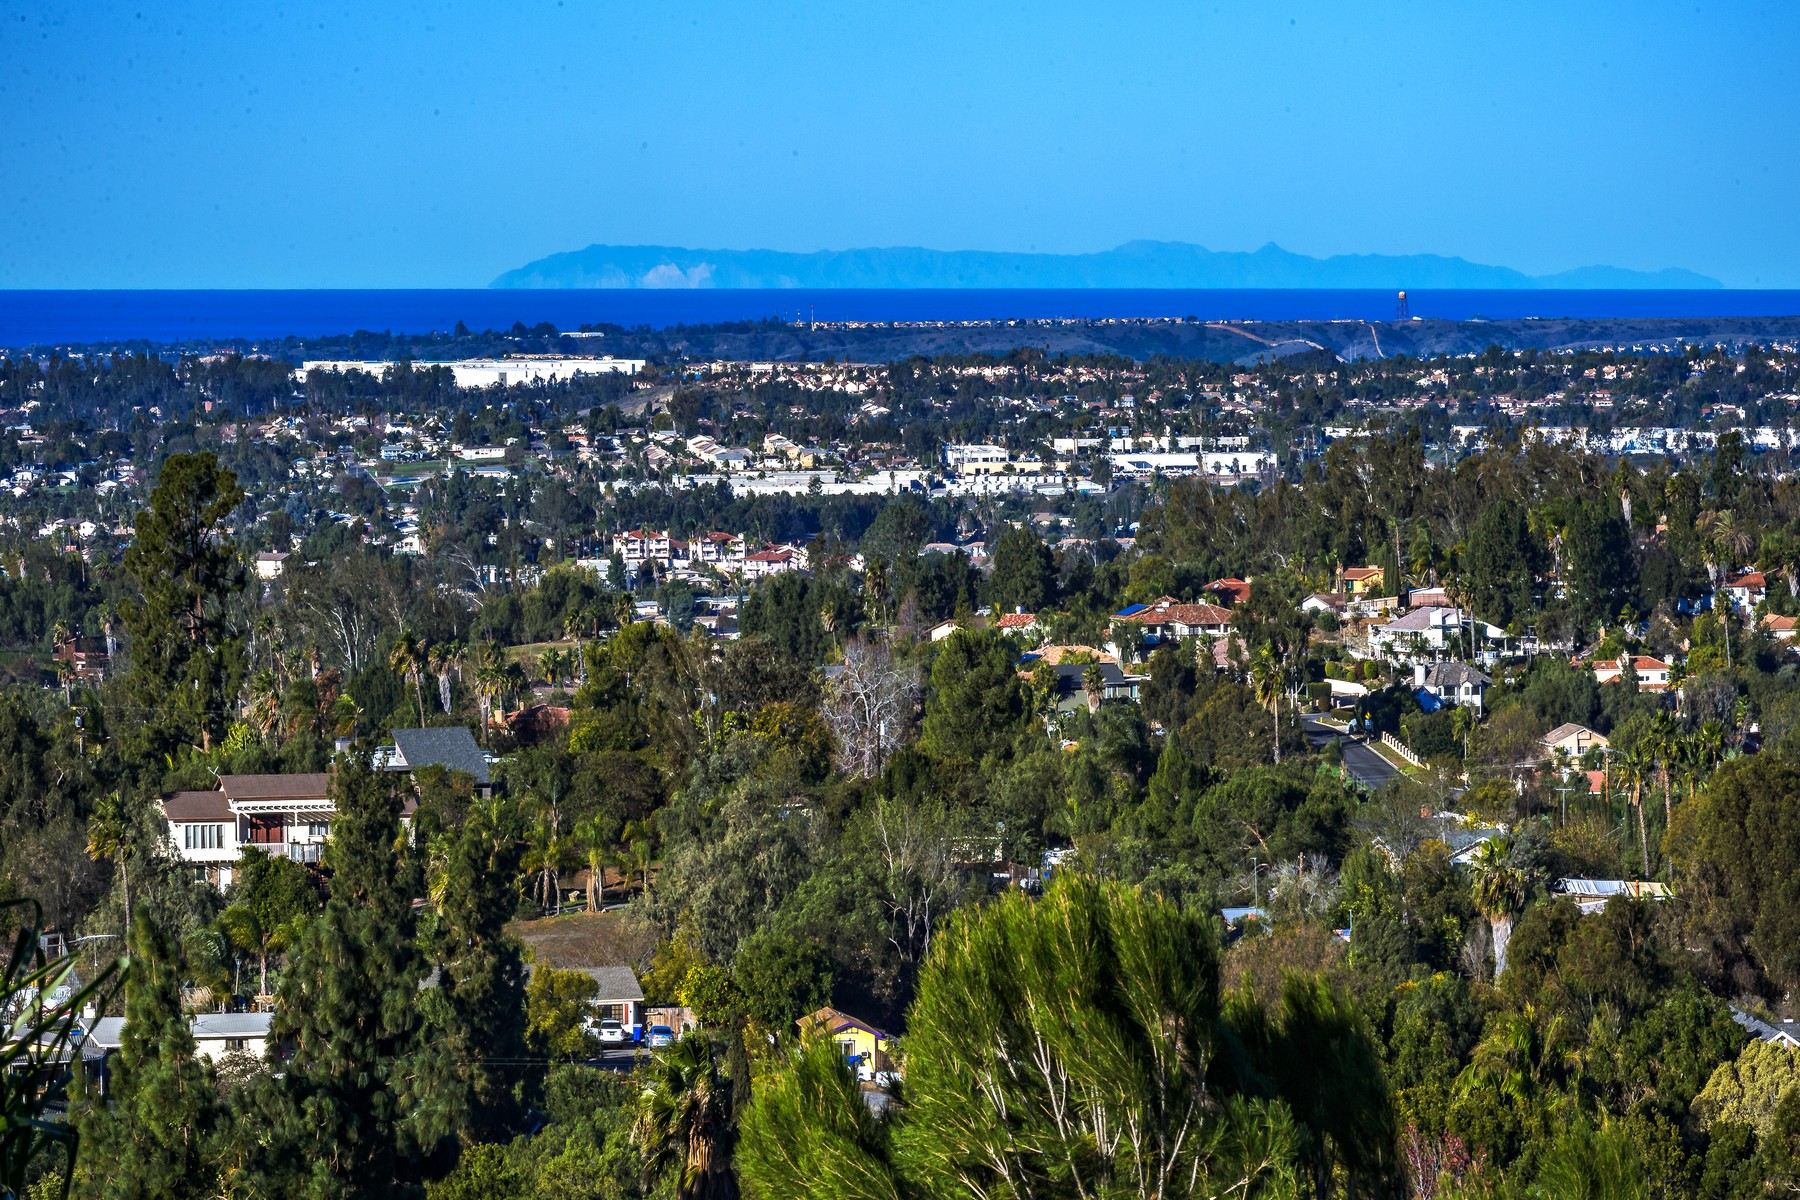 Single Family Home for Active at 2465 Catalina Avenue Vista, California 92084 United States